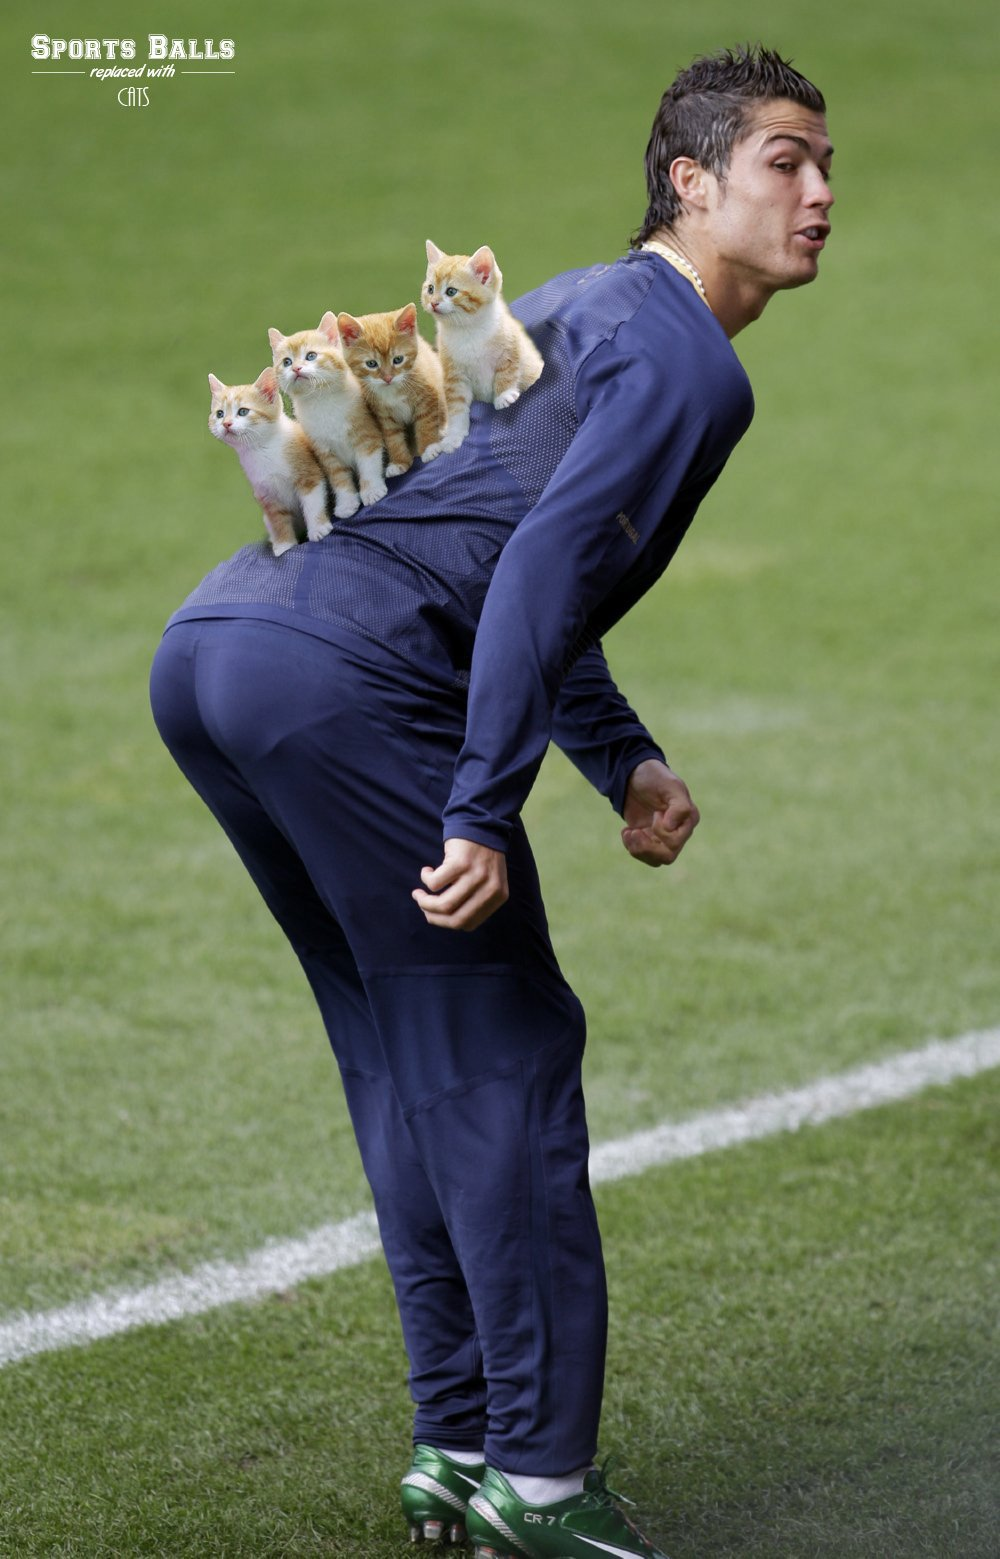 Фото на аву для пацанов футболистов